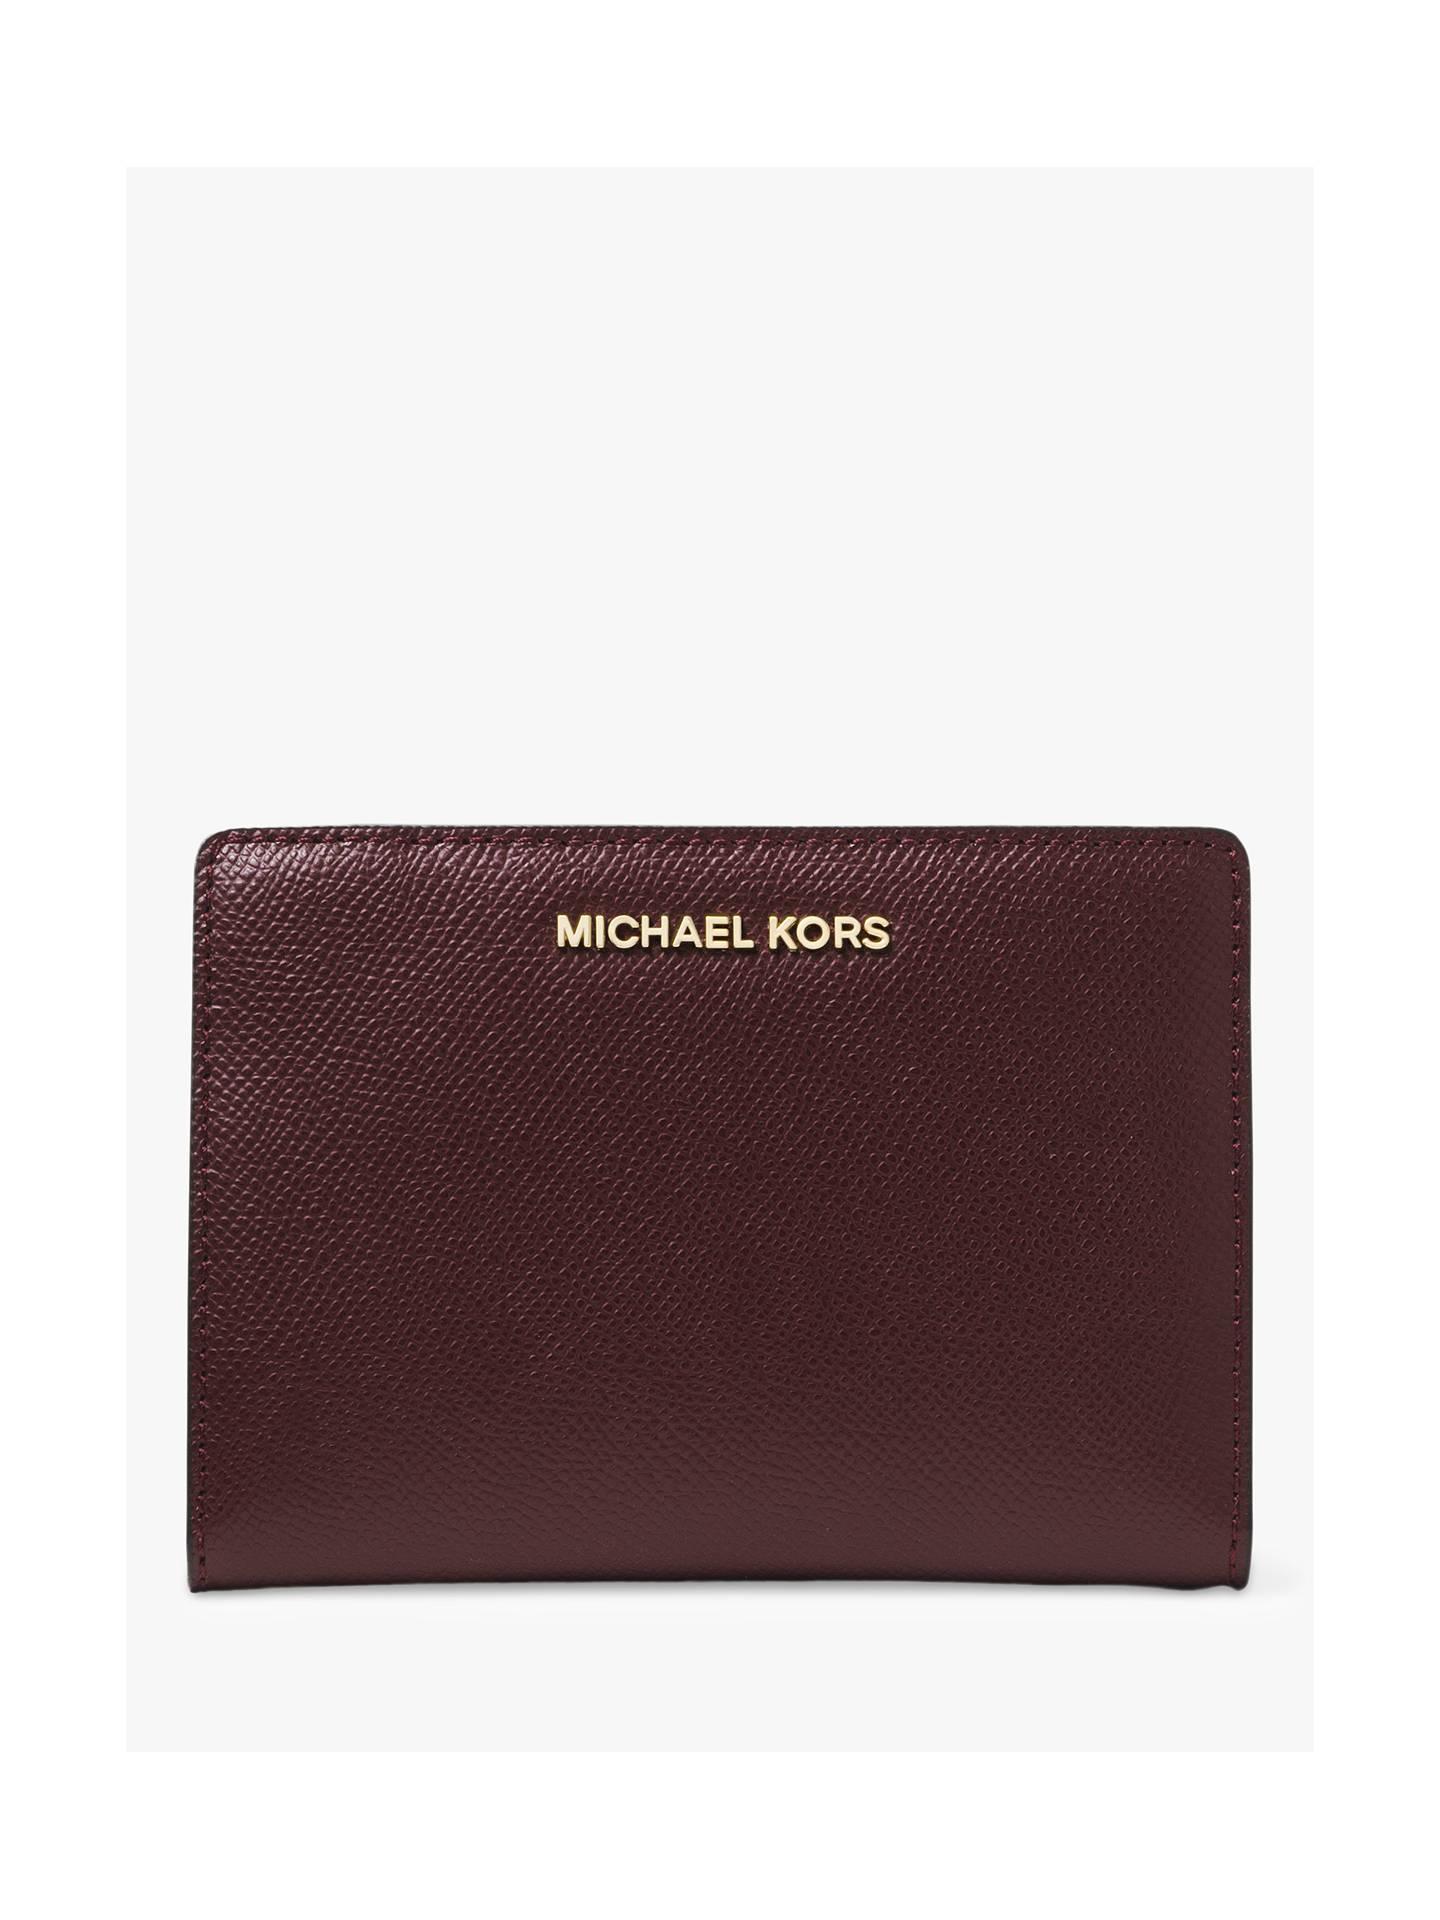 05a5aa22b3cb2 Michael Kors Money Pieces Leather Card Case Purse at John Lewis ...